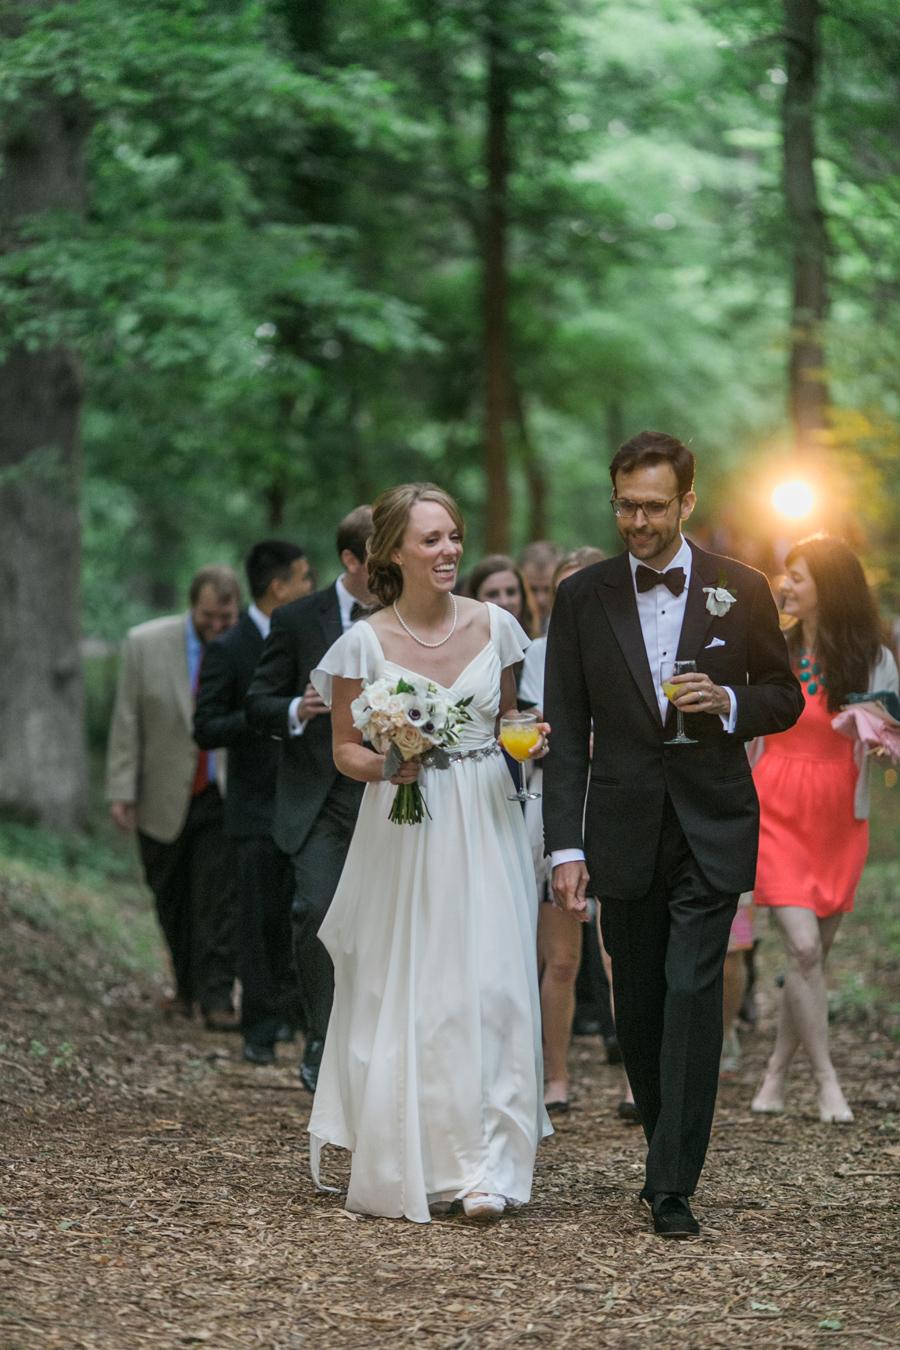 038-rustic-wedding-photography-washington-dc.jpg